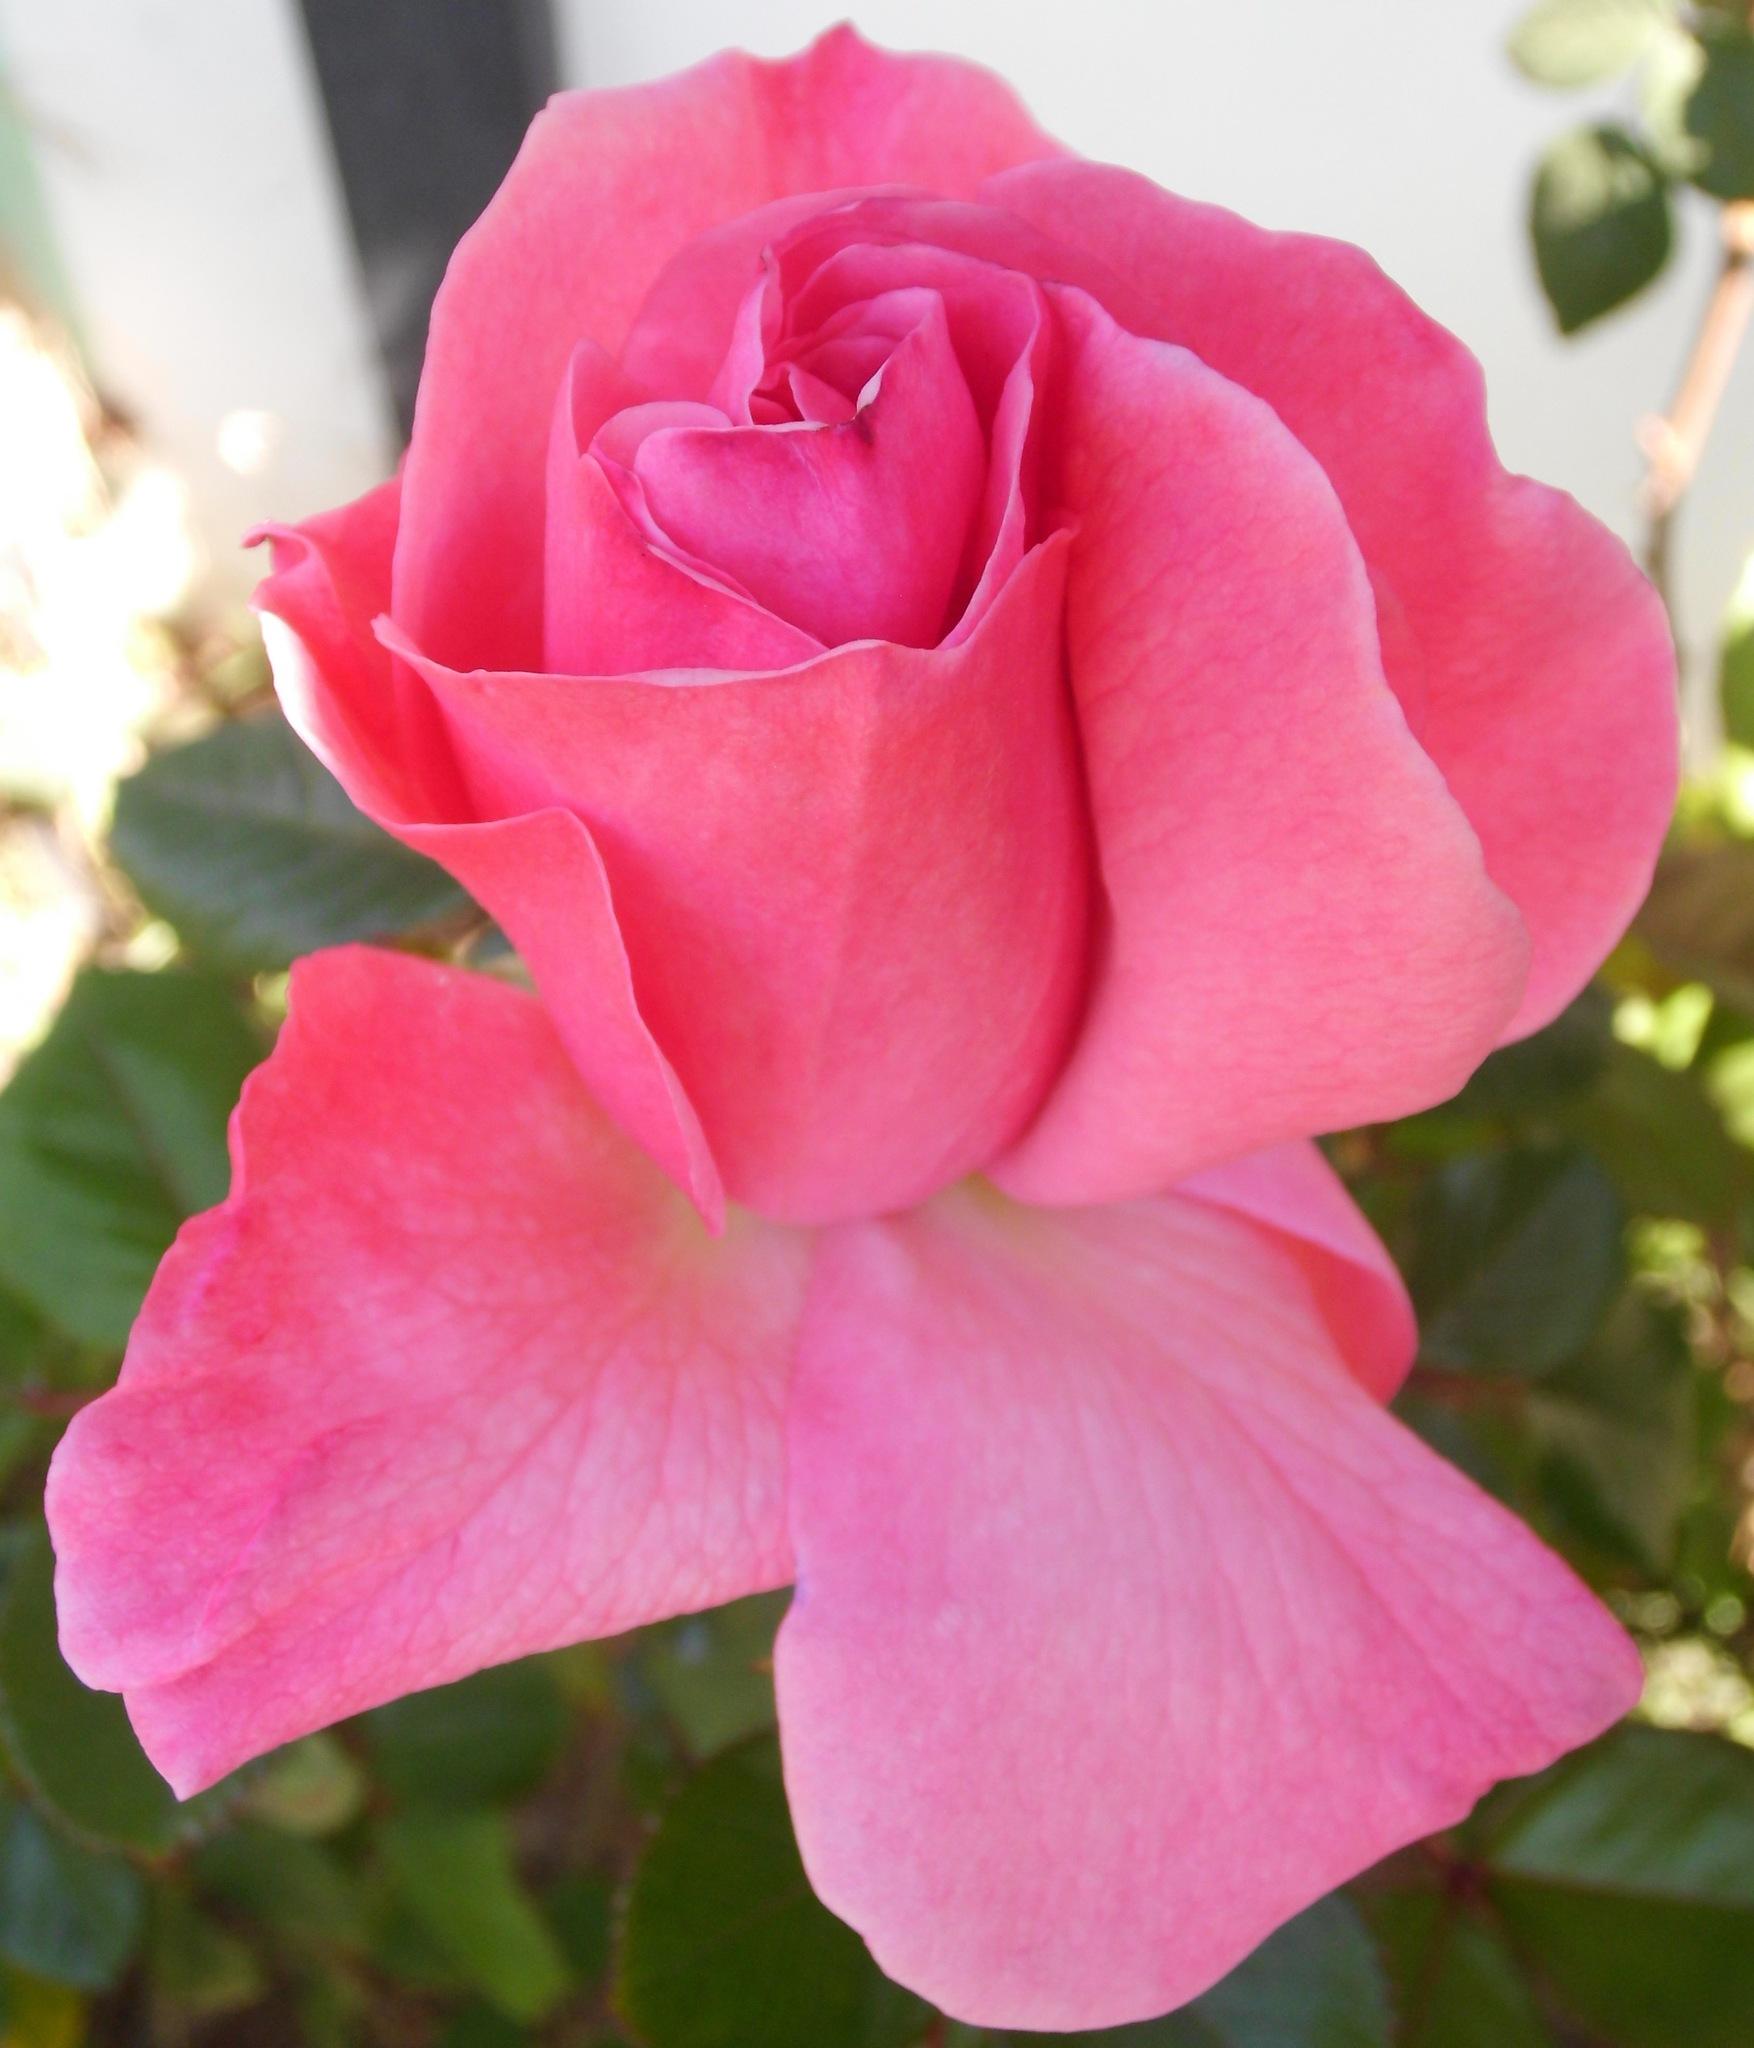 Rosa rosa by Cristina Angélica